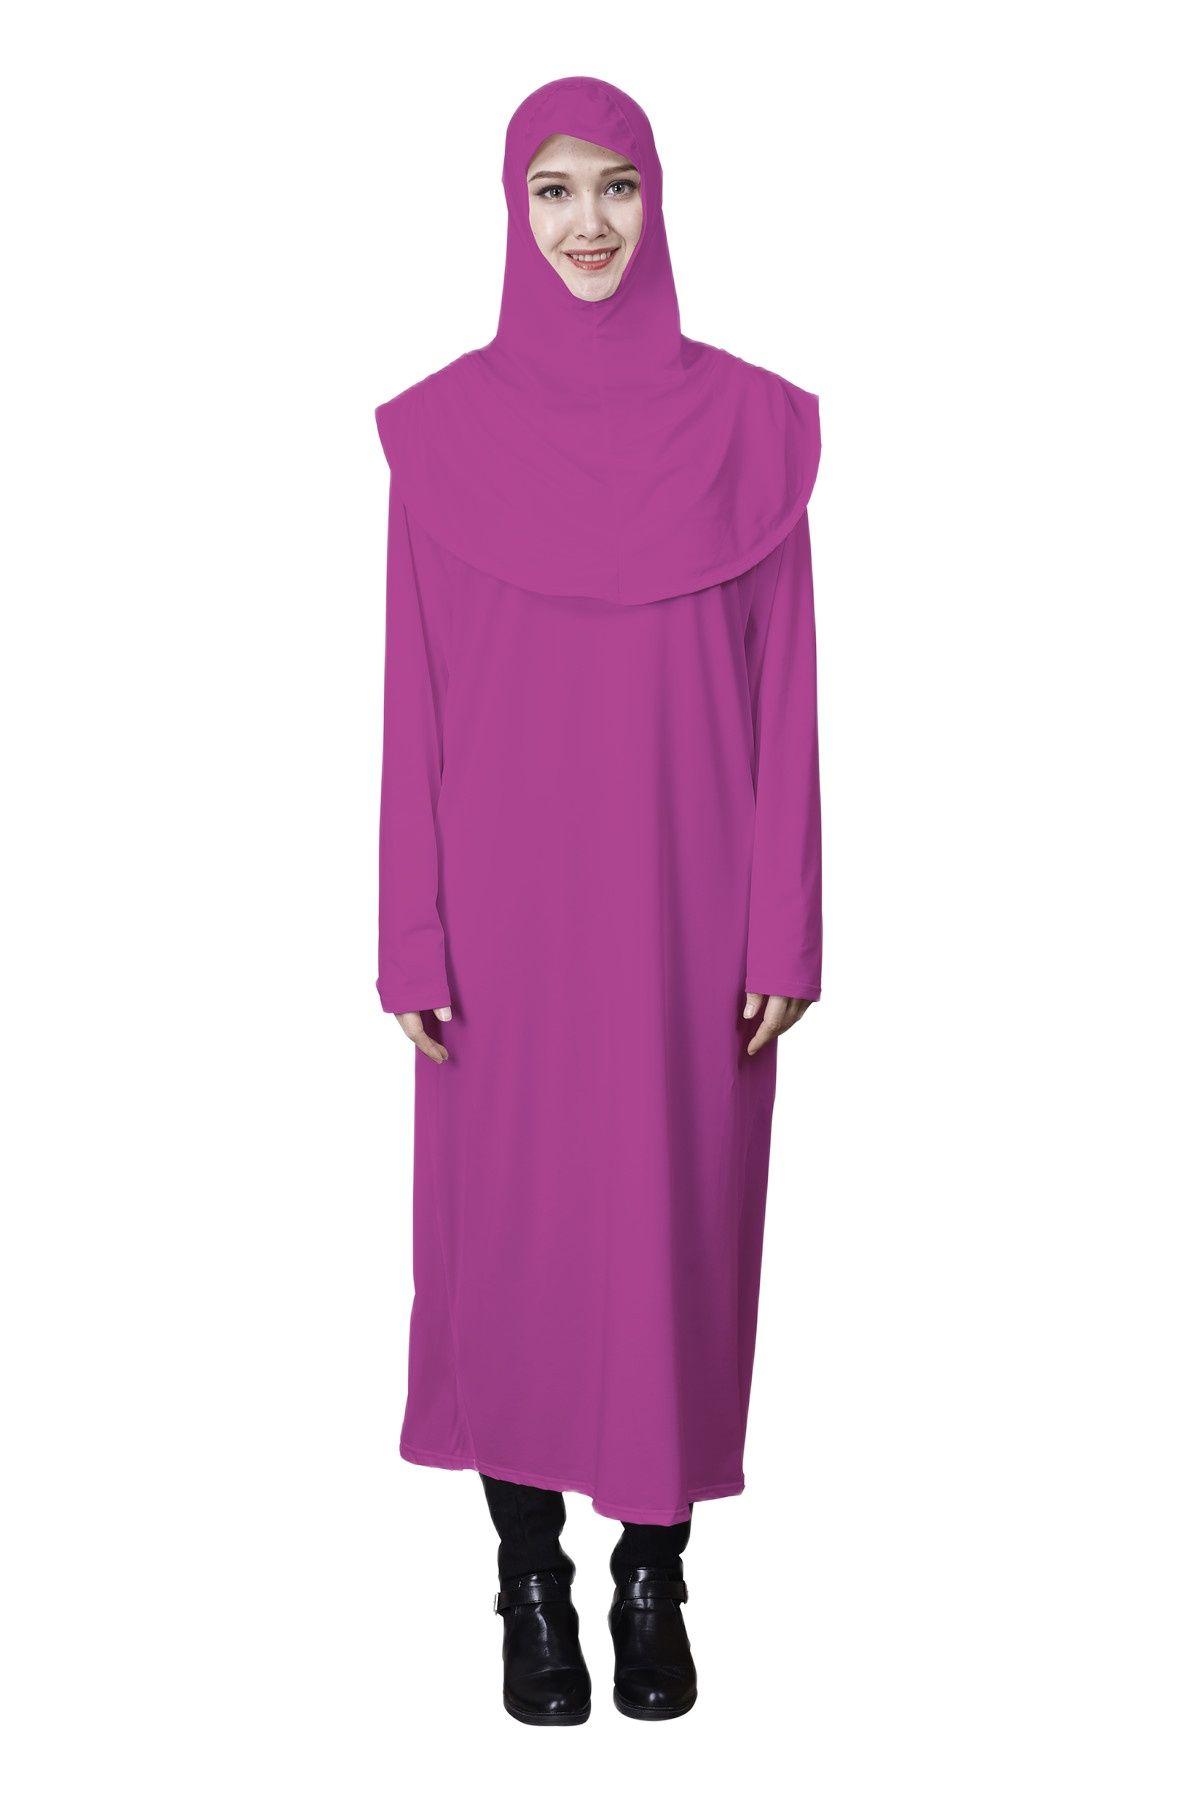 Muslim Caftan Ropa Musulman Mujer Islamic Dress Abayas for Women Dubai Applique Beading Abaya